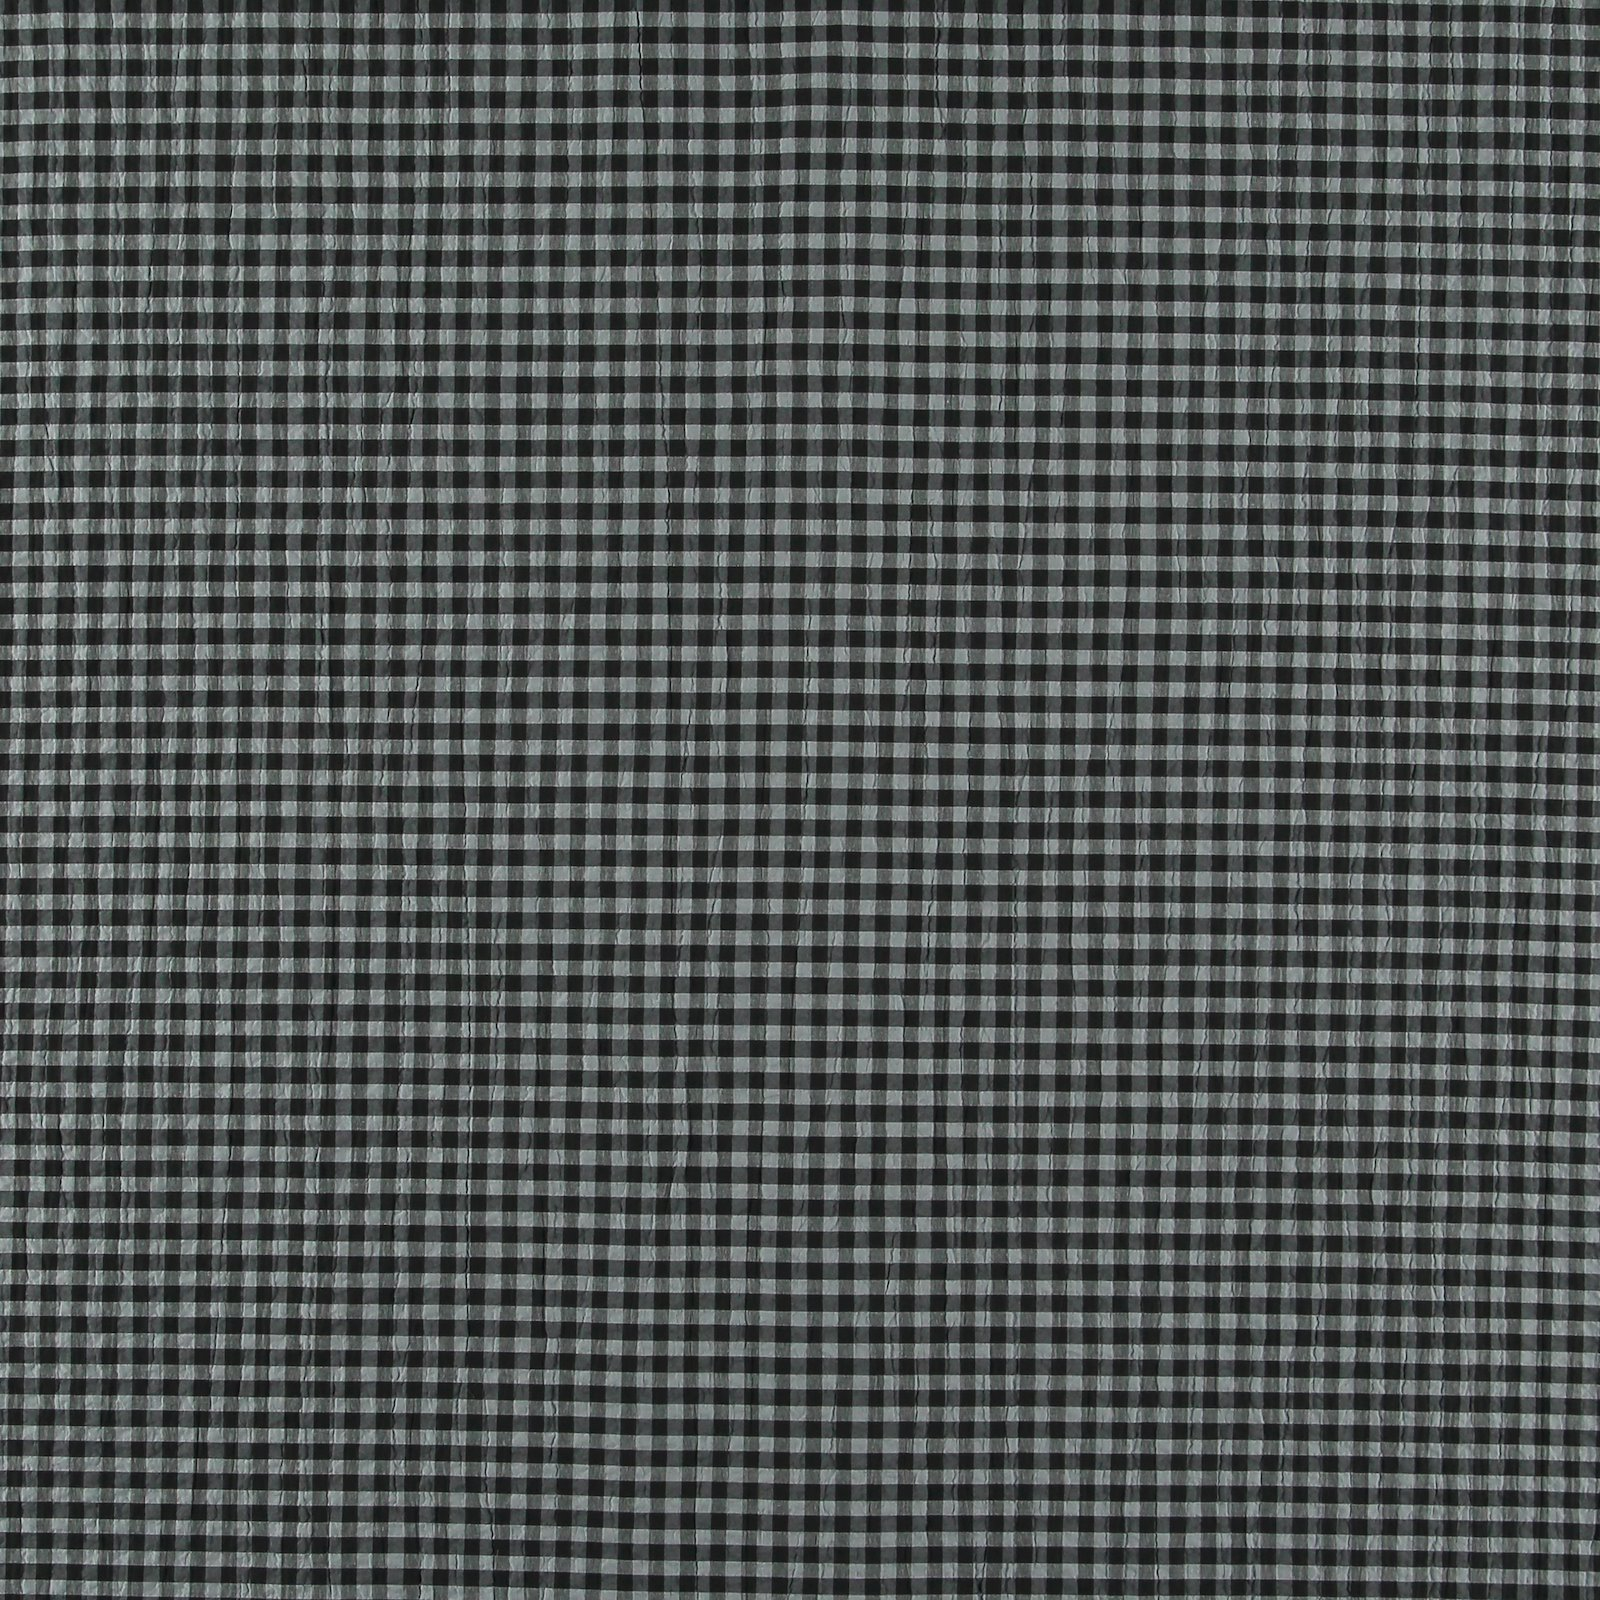 Seersucker black/bluegrey YD check 580075_pack_sp